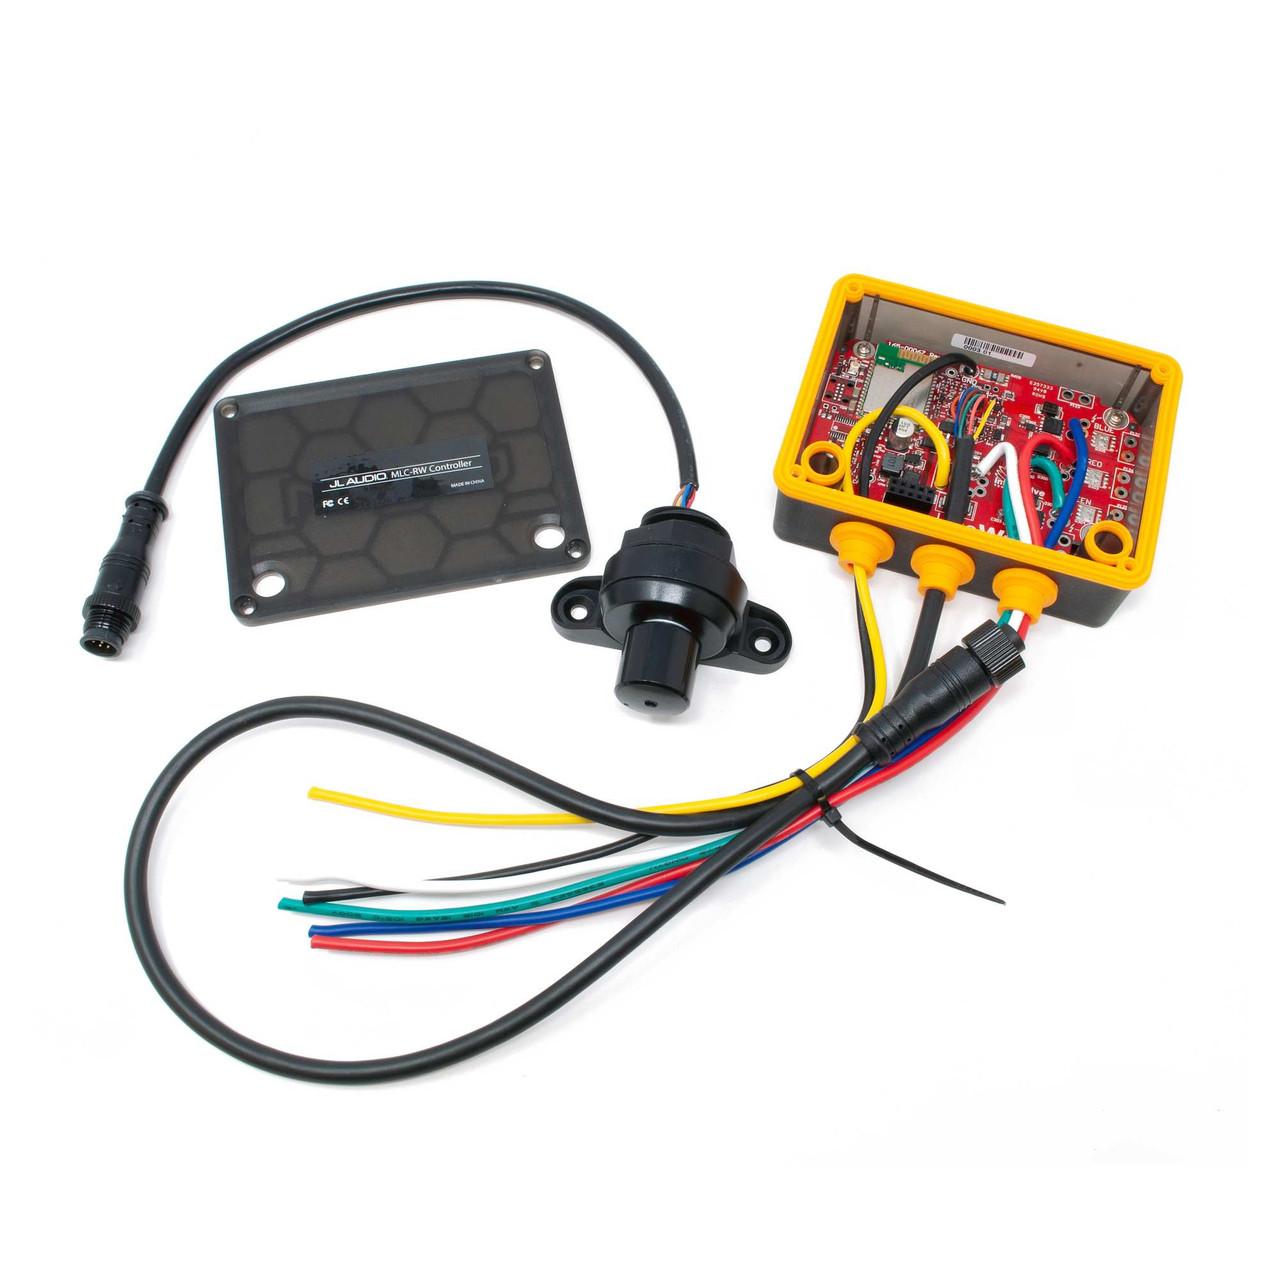 medium resolution of  jl audio mlc rw marine led lighting controller with wifi